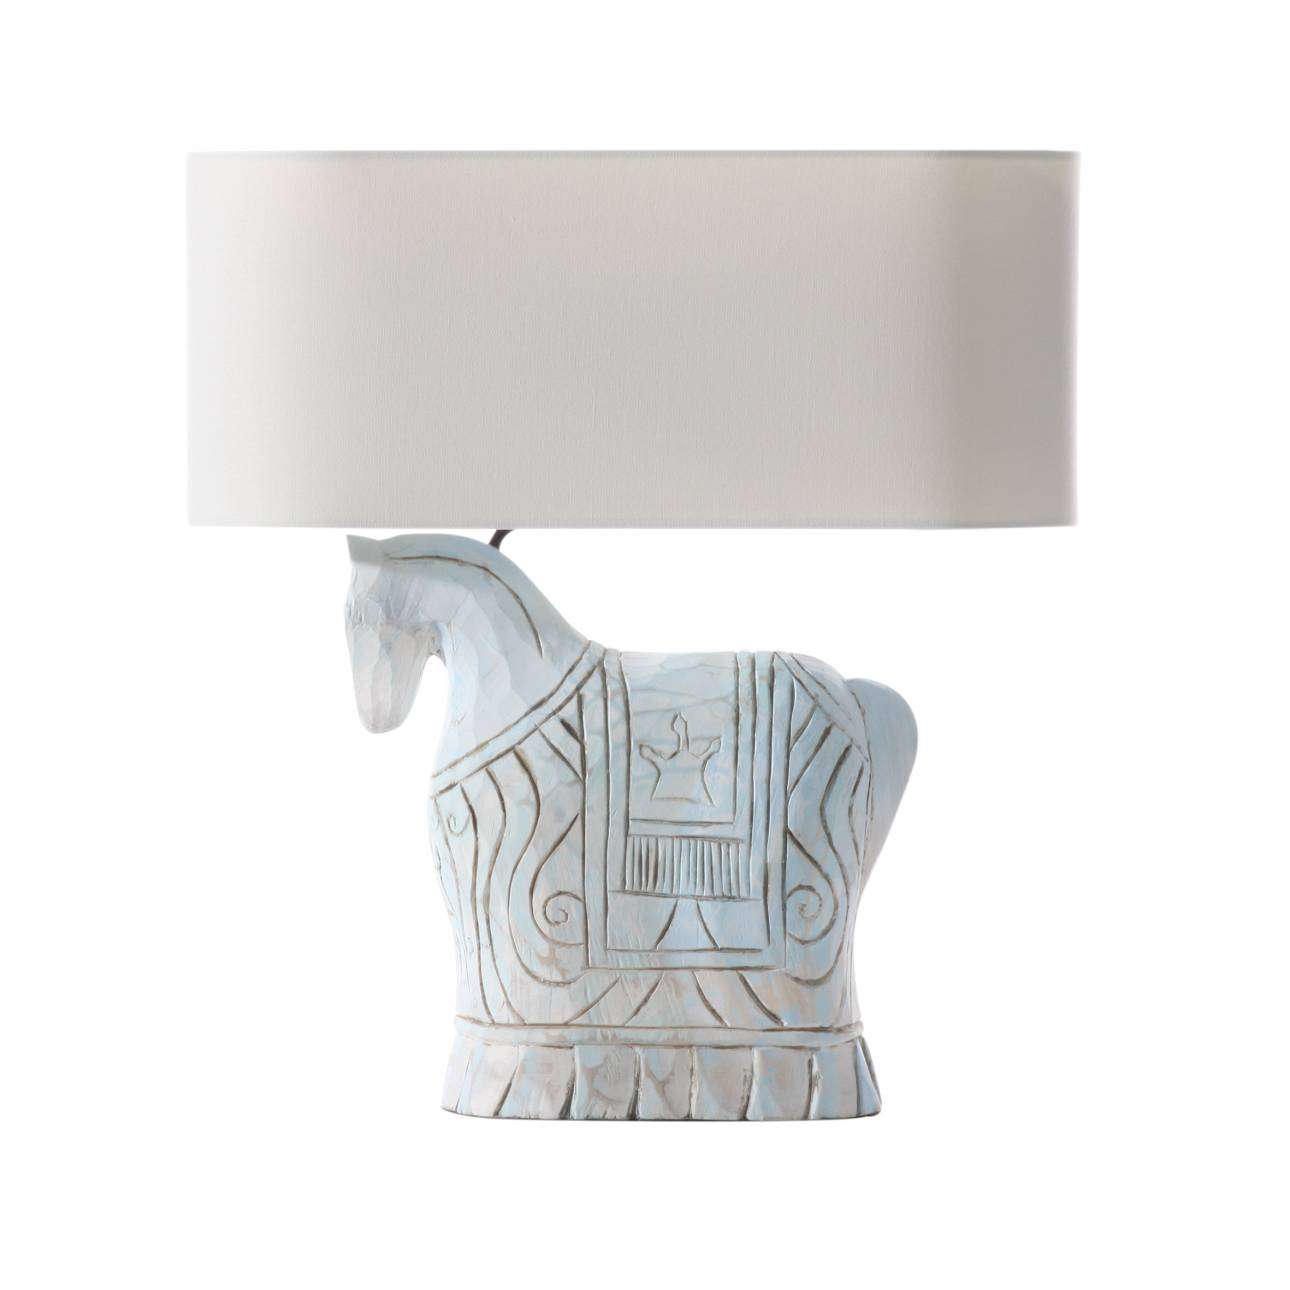 Tischlampe Bahima 60cm  46x20x60cm